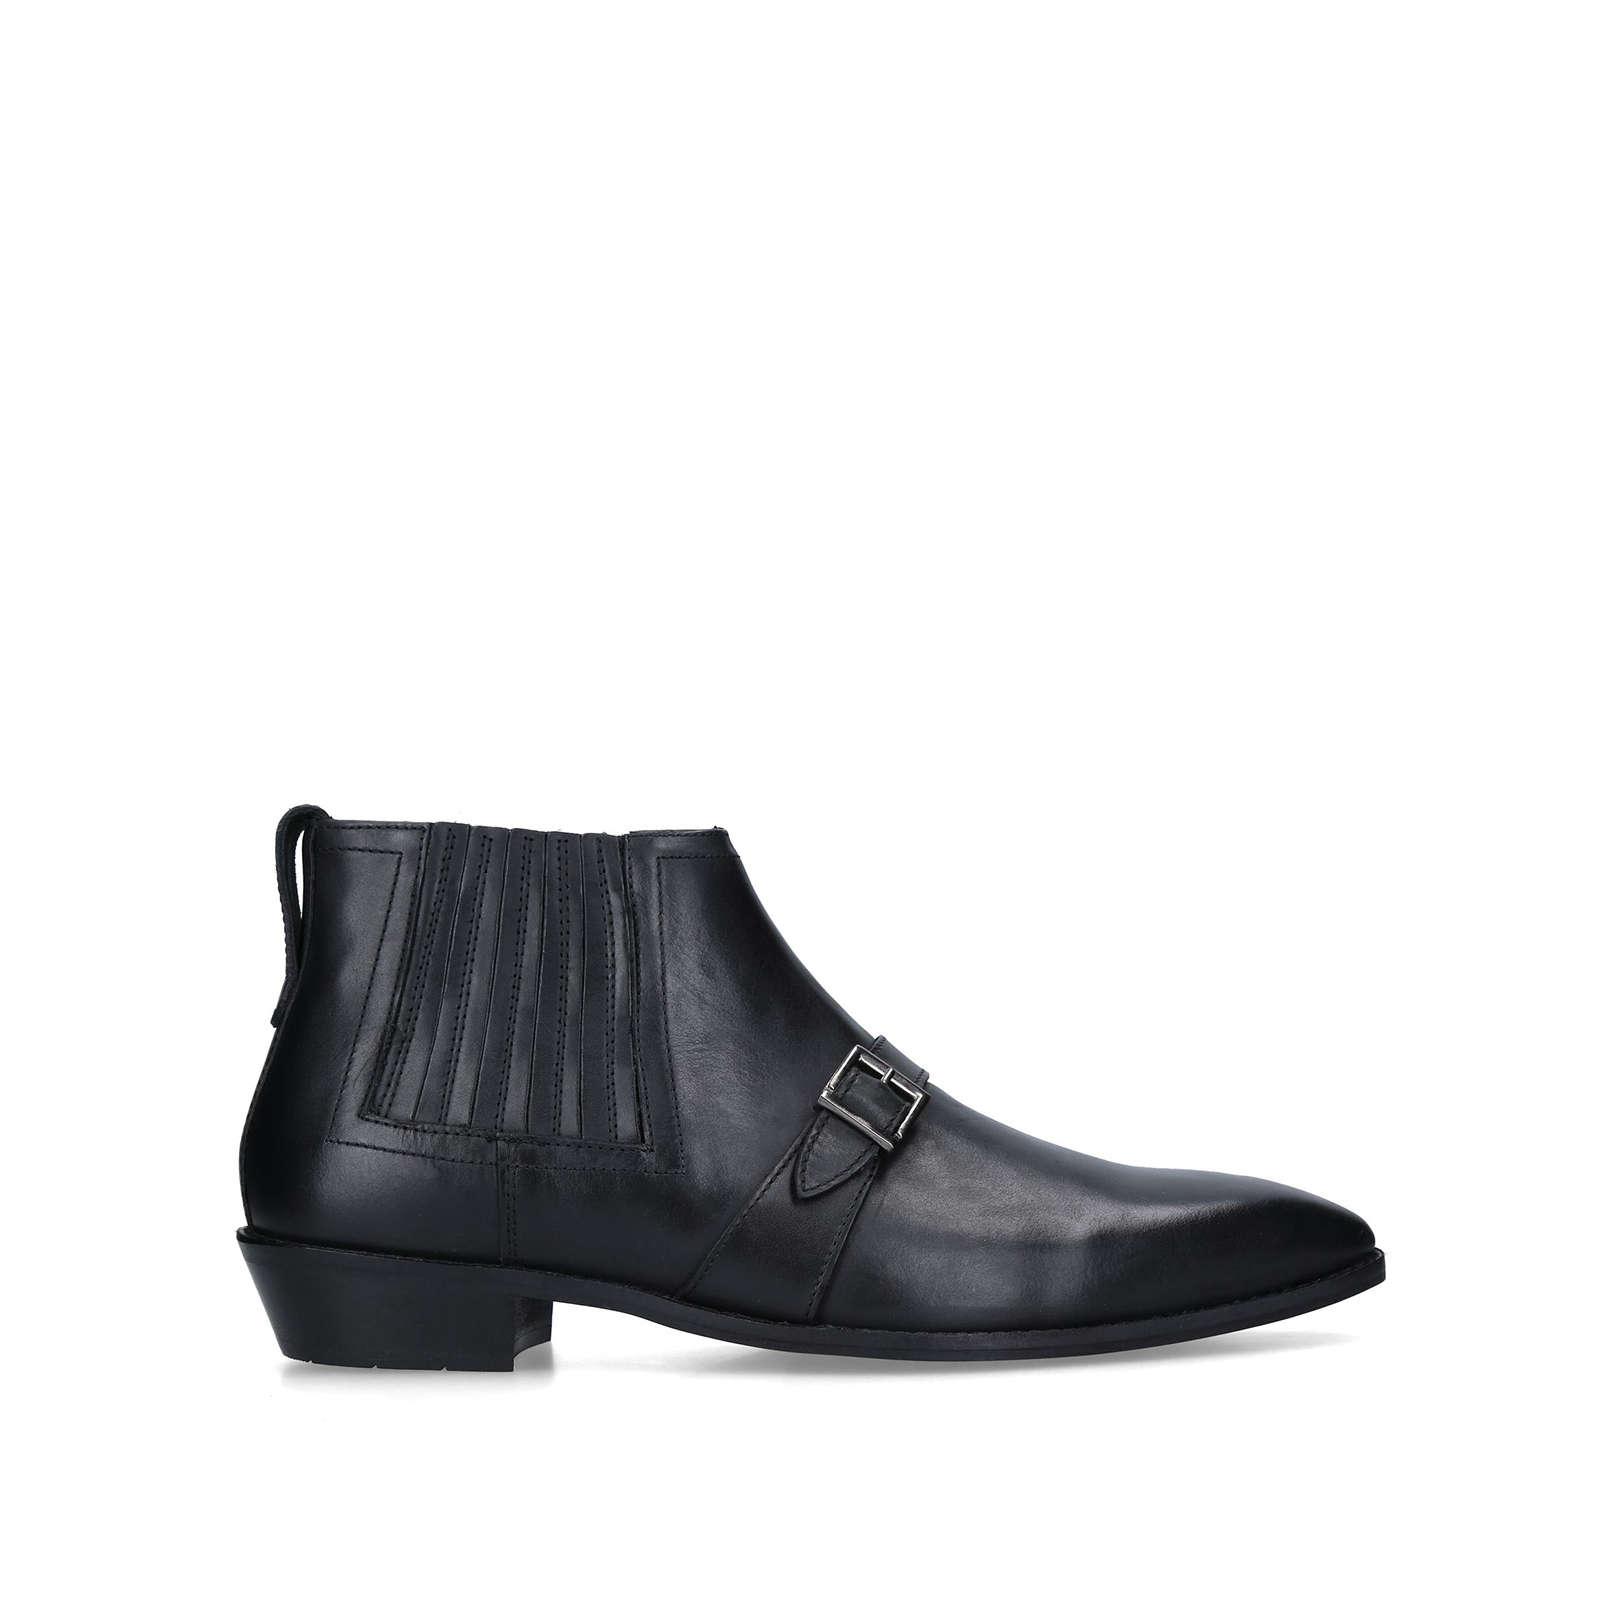 JAX - KG KURT GEIGER Boots